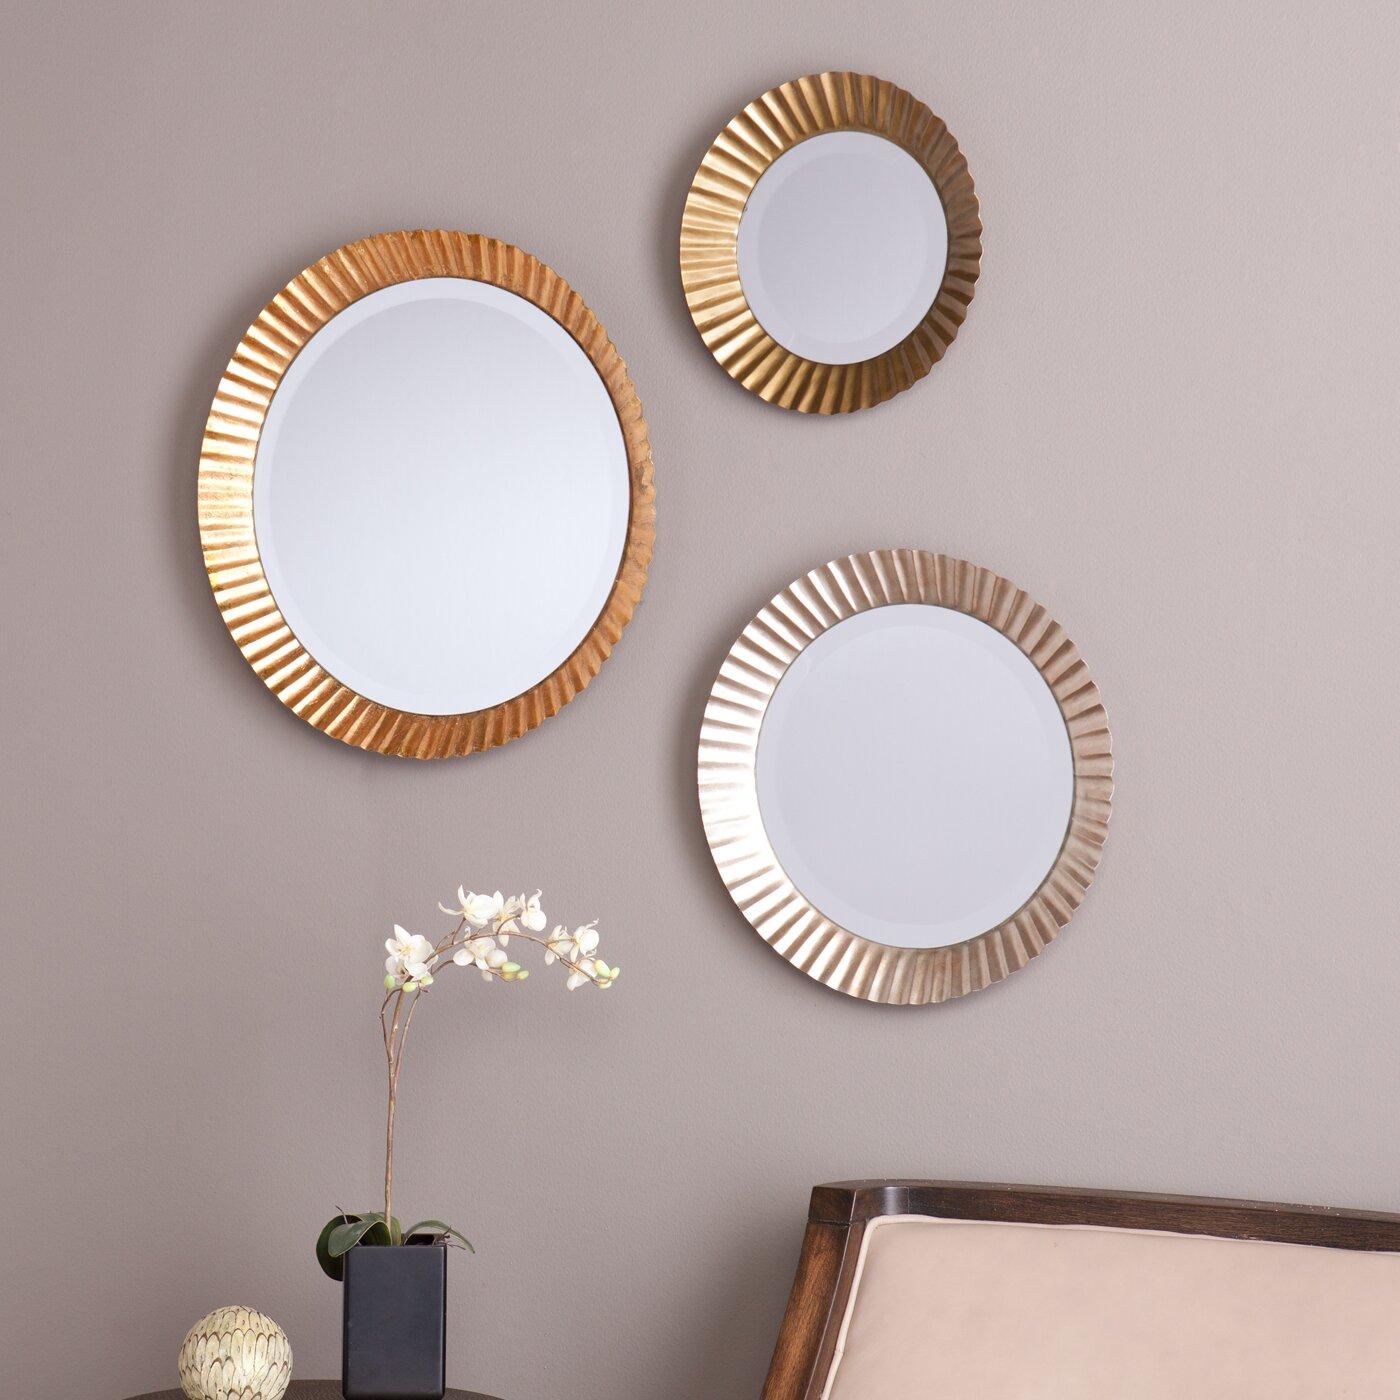 Brayden studio 3 piece wall mirror set reviews wayfair for Mirror of mirror